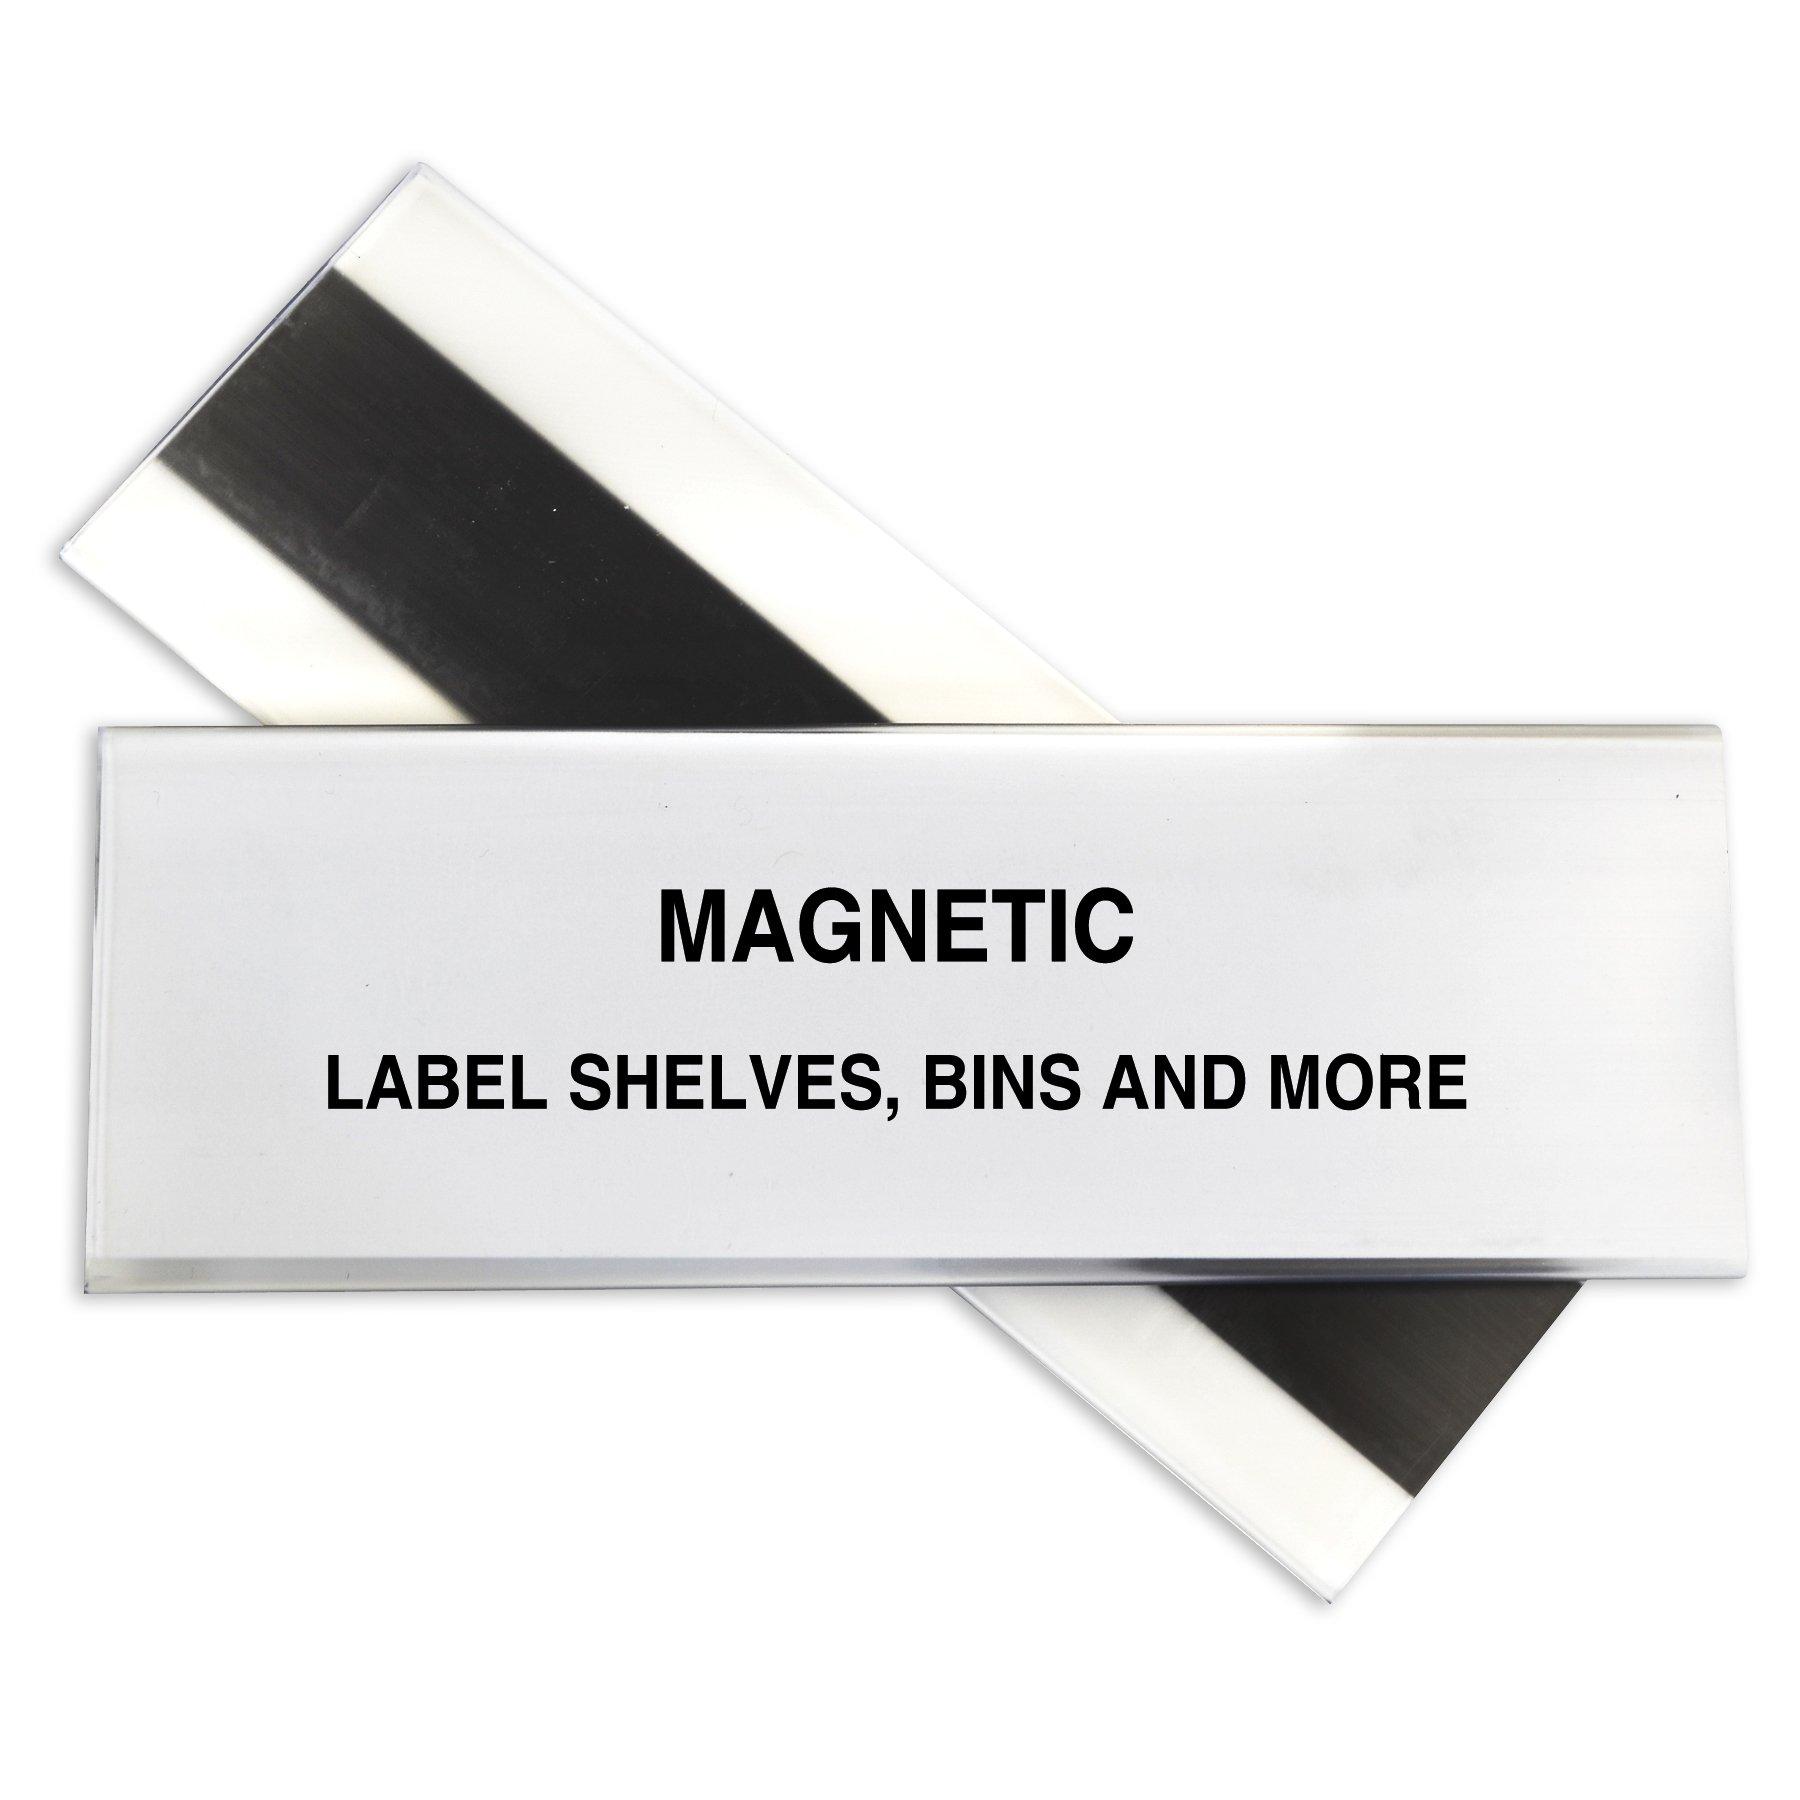 C-Line HOL-DEX Magnetic Shelf/Bin Label Holders, 2 x 6 Inches, 10 per Box (87247)